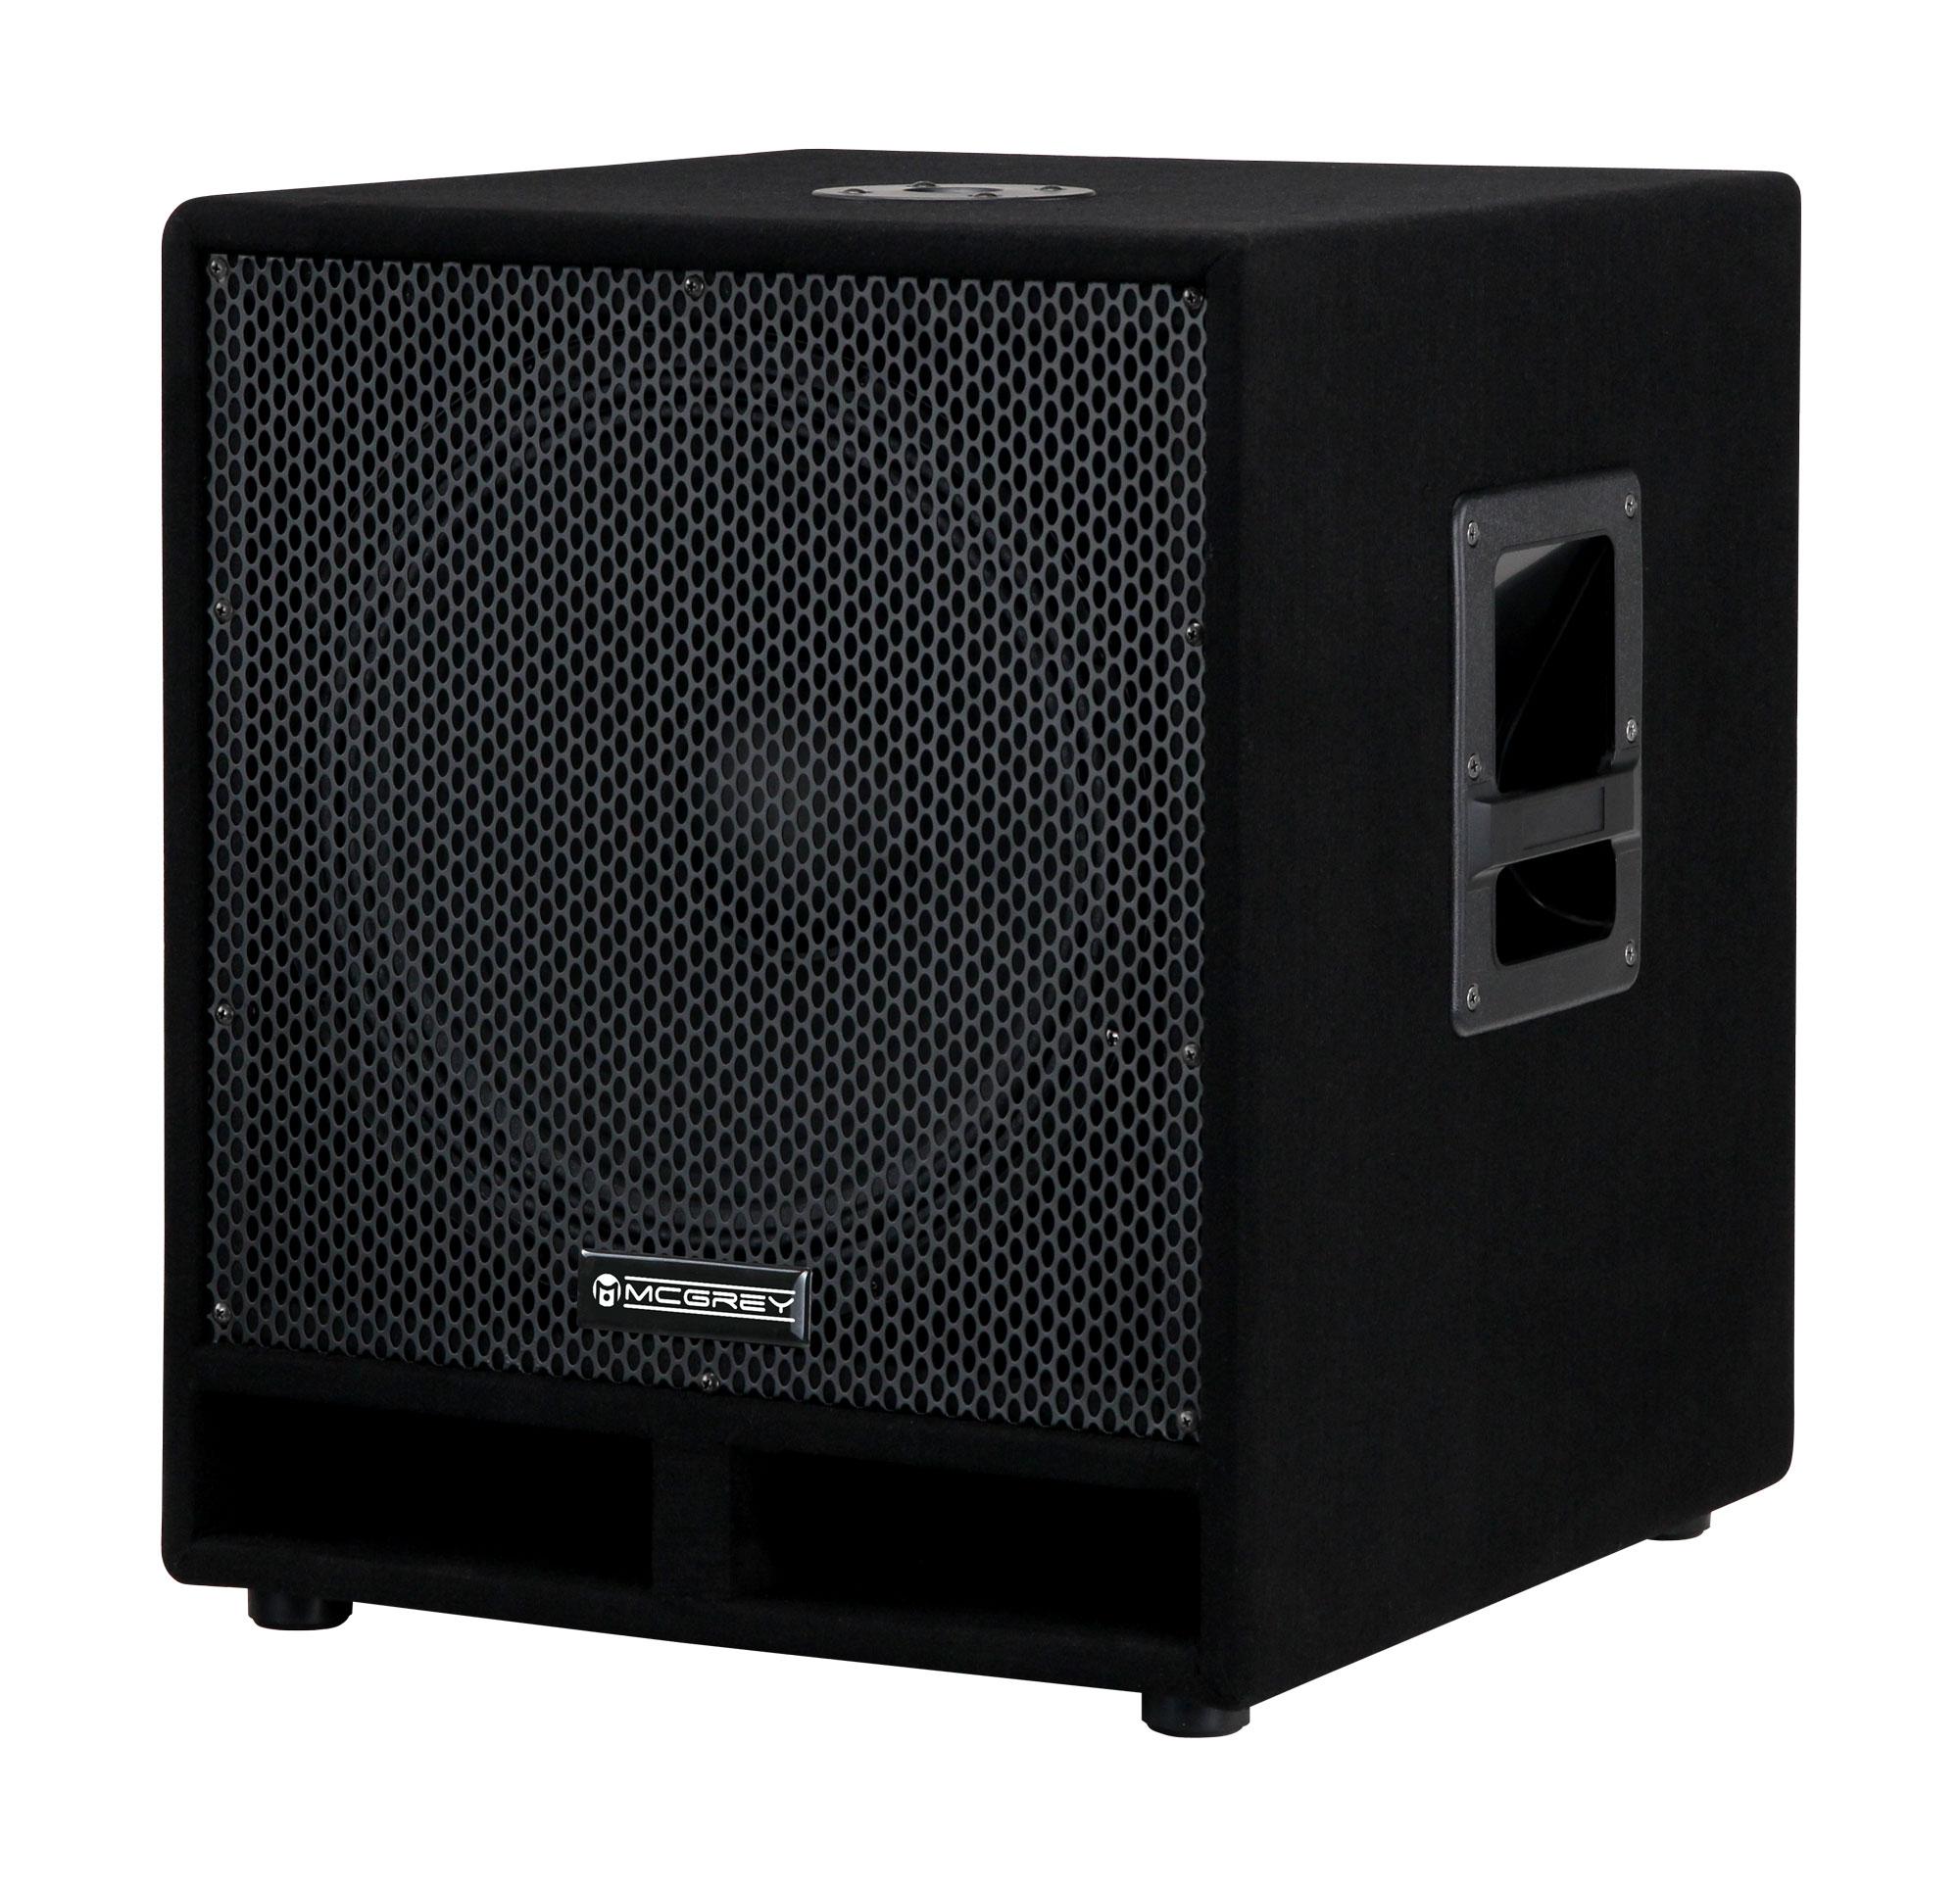 Paendstufen - McGrey PAS 115 15' passiver PA Subwoofer Bass Lautsprecher Box 1200 Watt Retoure (Zustand akzeptabel) - Onlineshop Musikhaus Kirstein